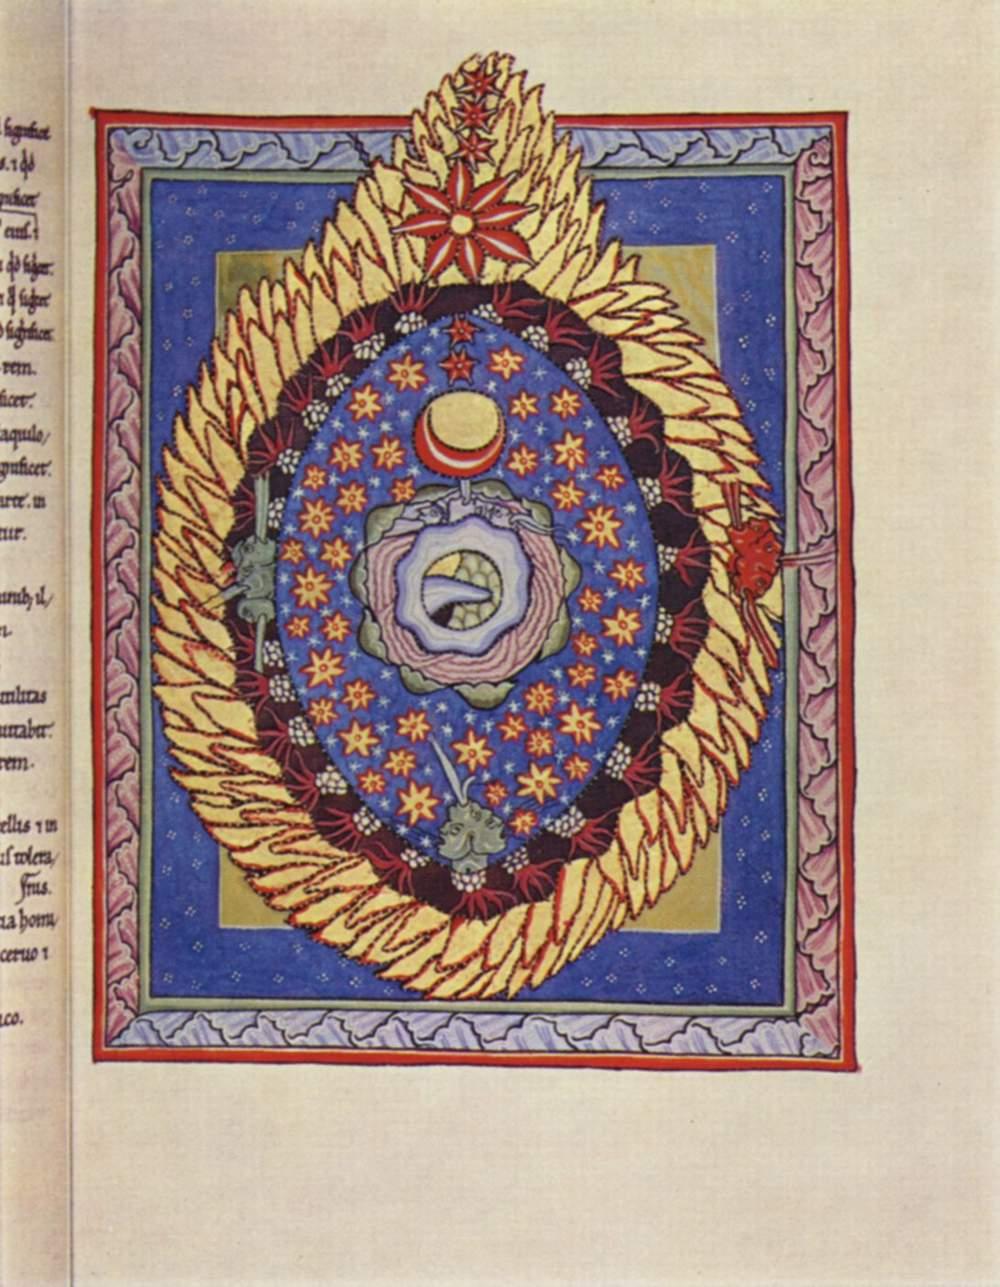 Meister des Hildegardis-Codex 001.jpg